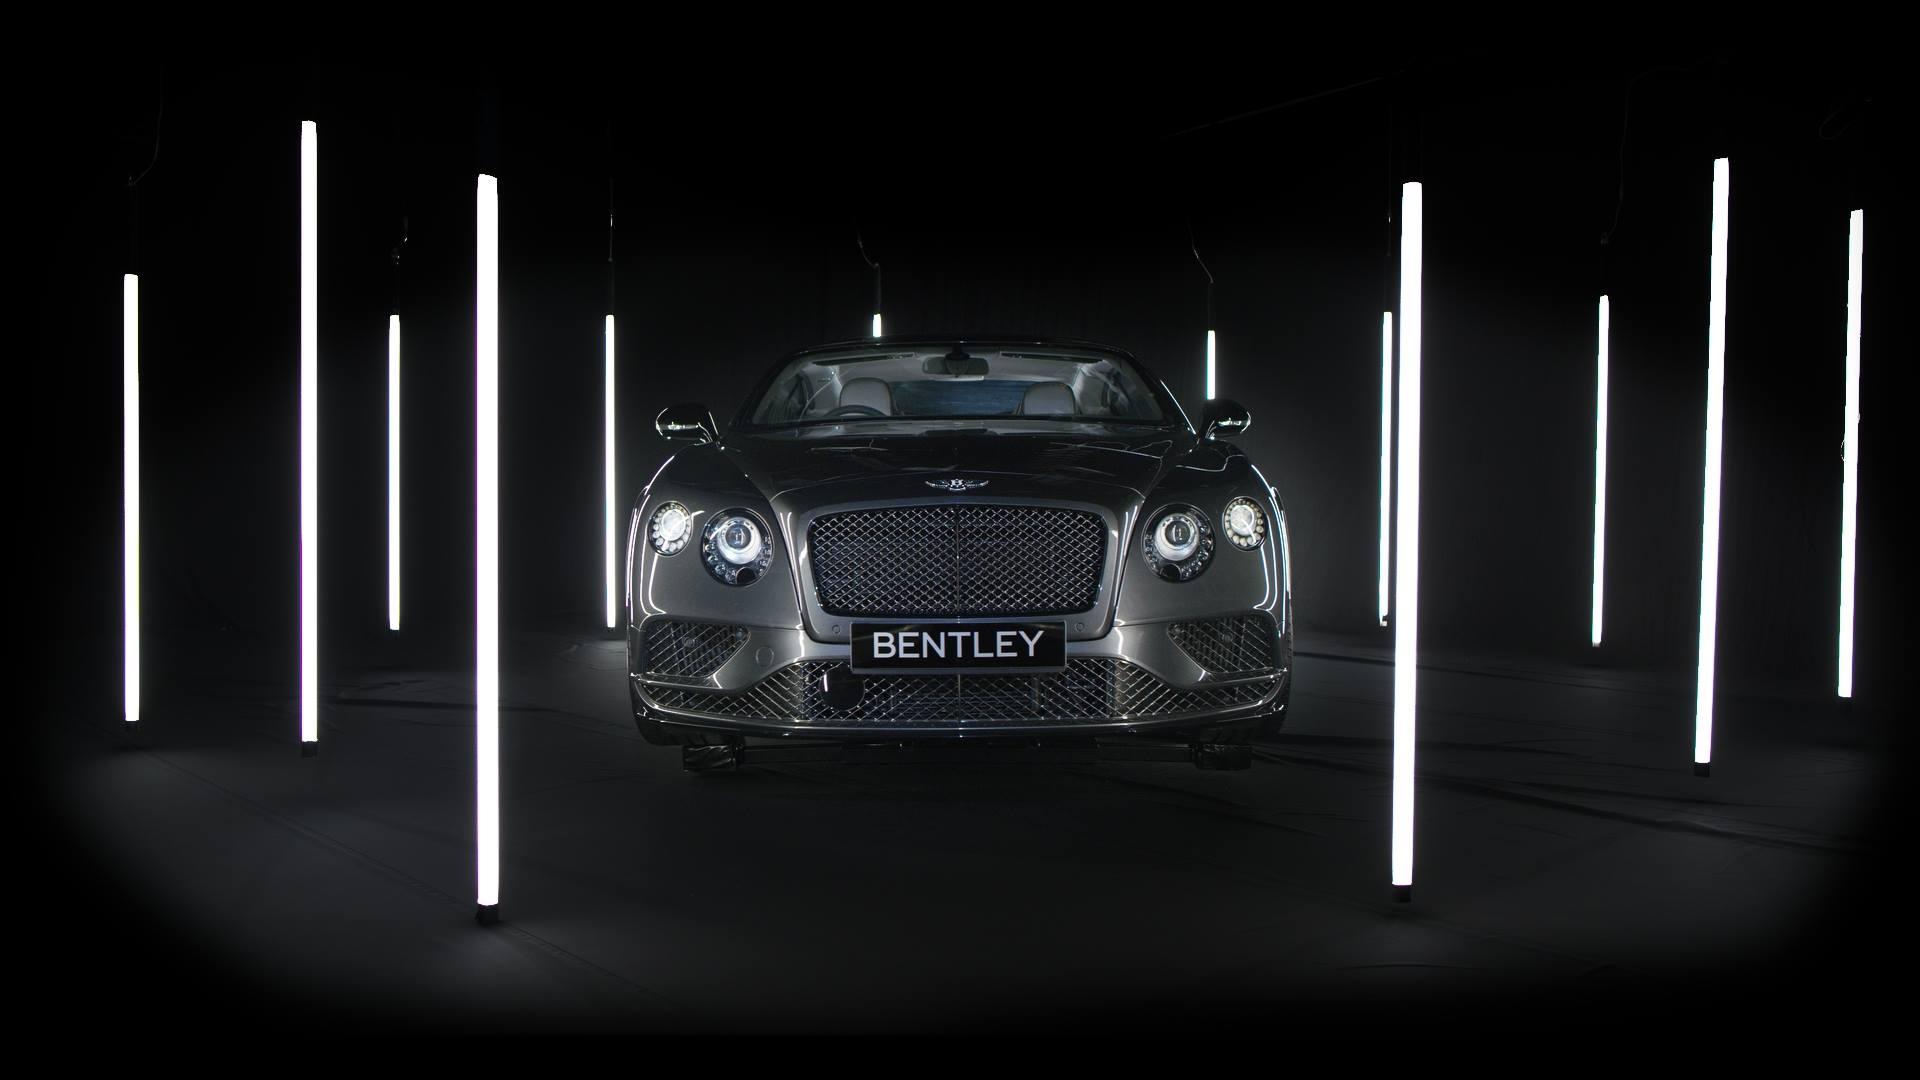 High concept Bentley spec commercial car advert using encapsulites